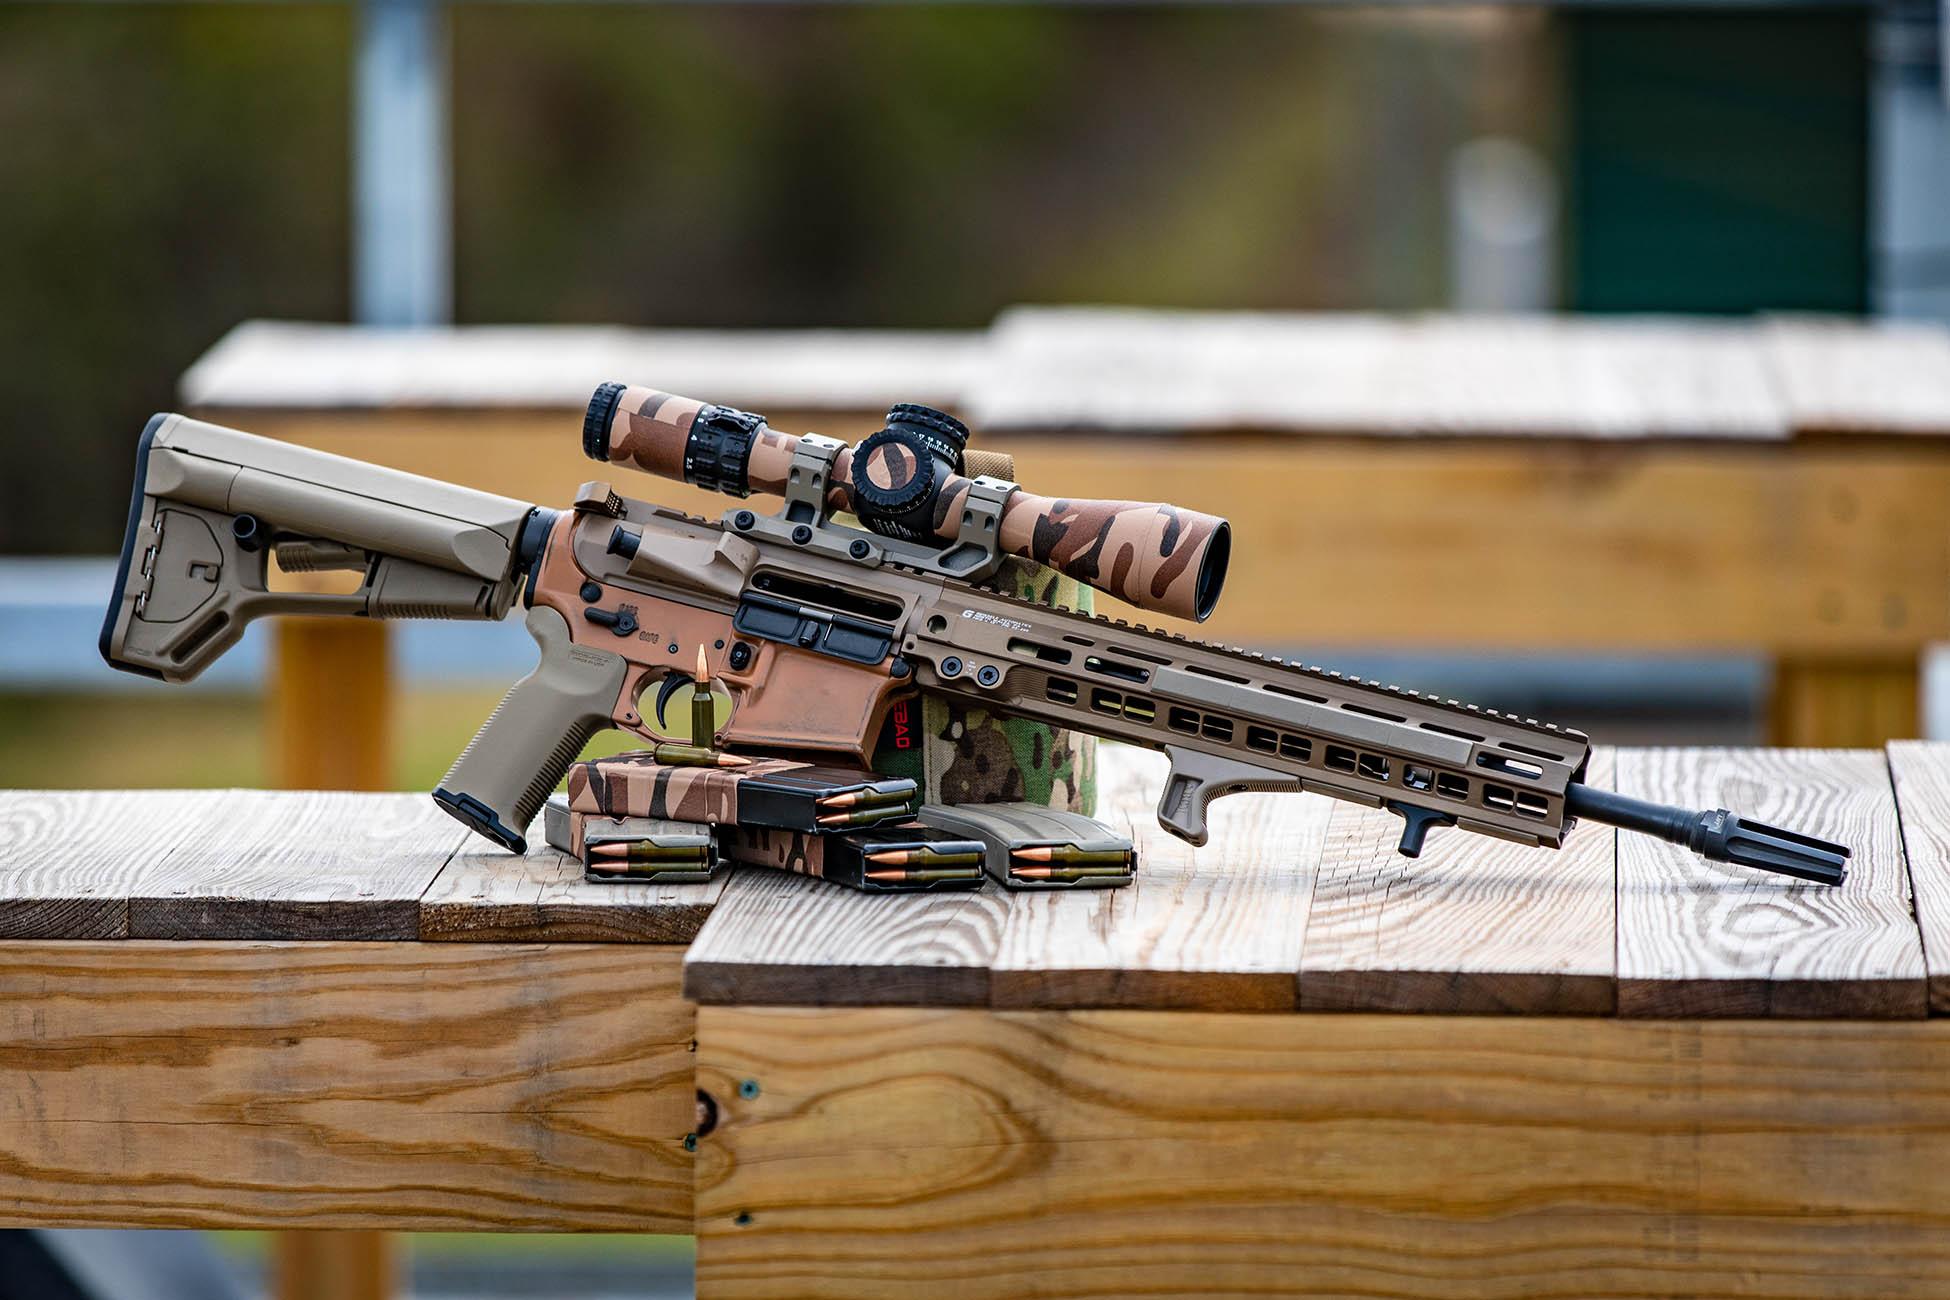 Magpul AR15 Carbine stock installed on a Geissele Automatics AR-15 Carbine for all purpose use